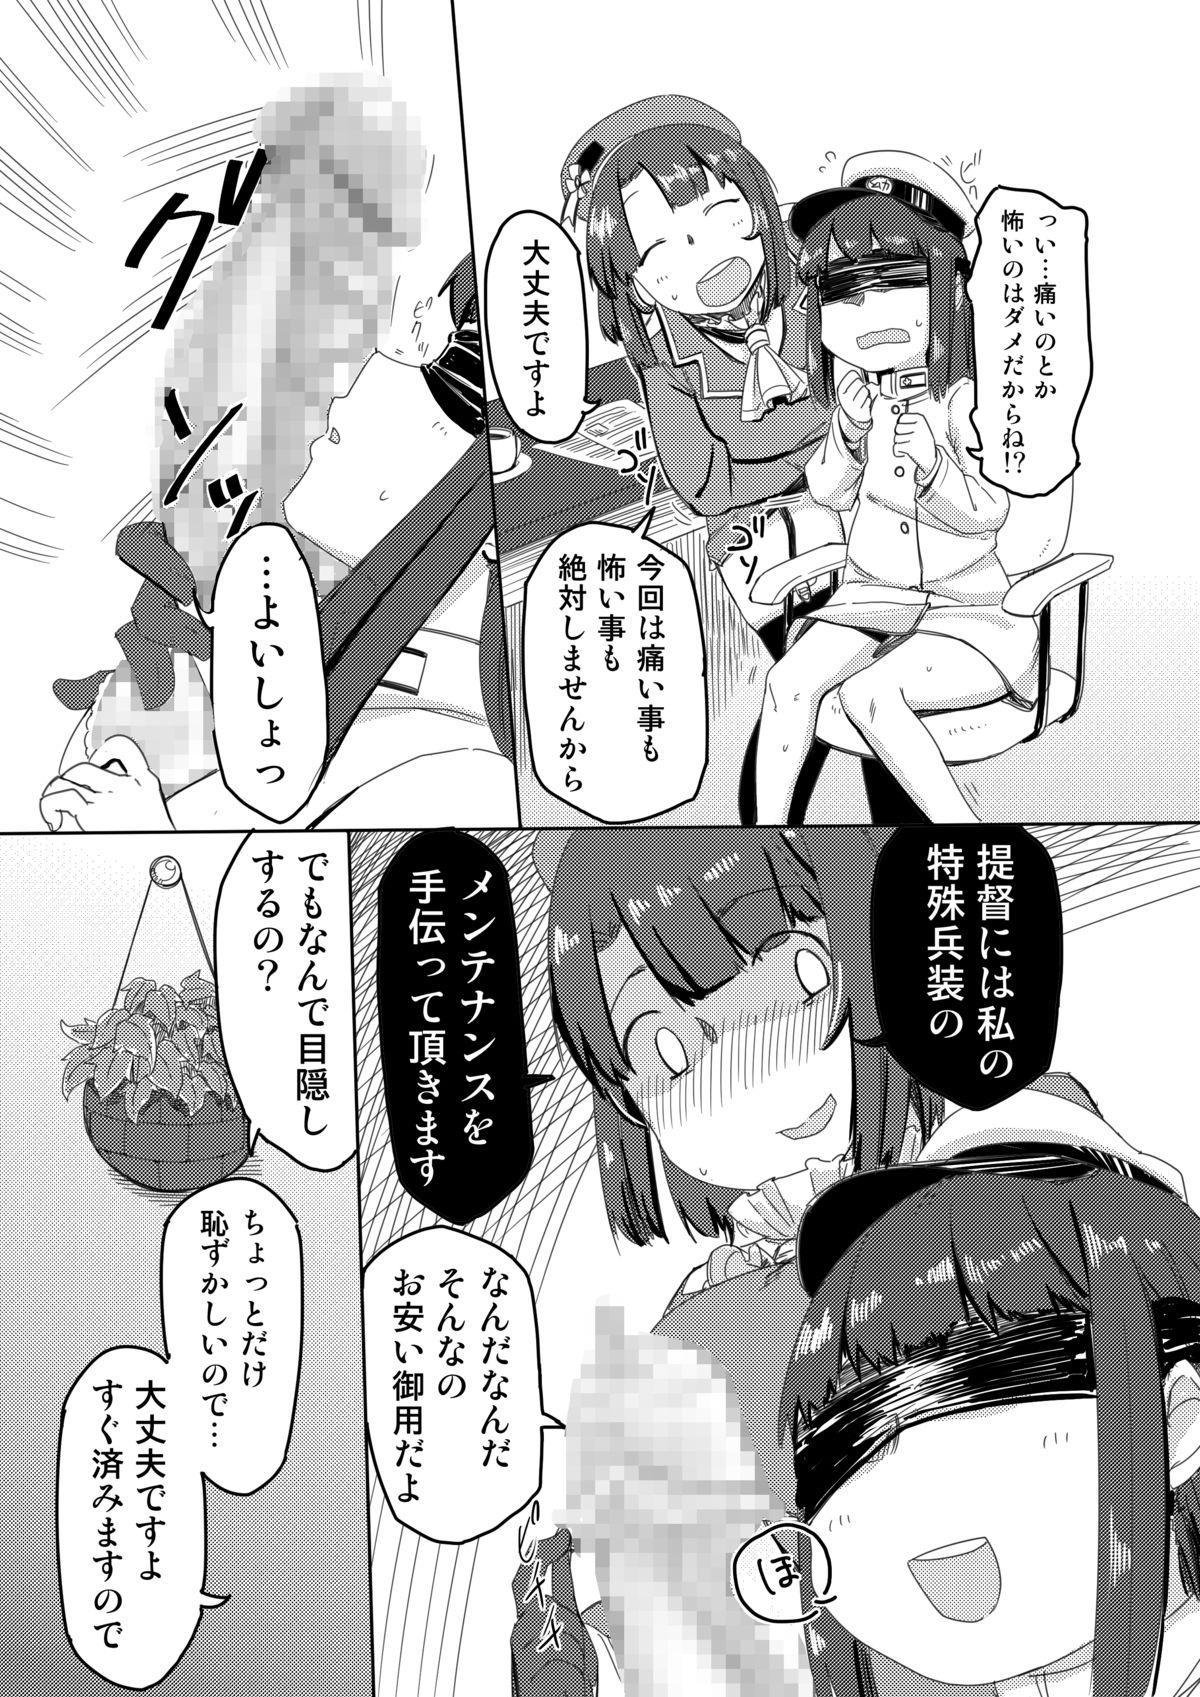 Teitoku to Takao-san Milk 3